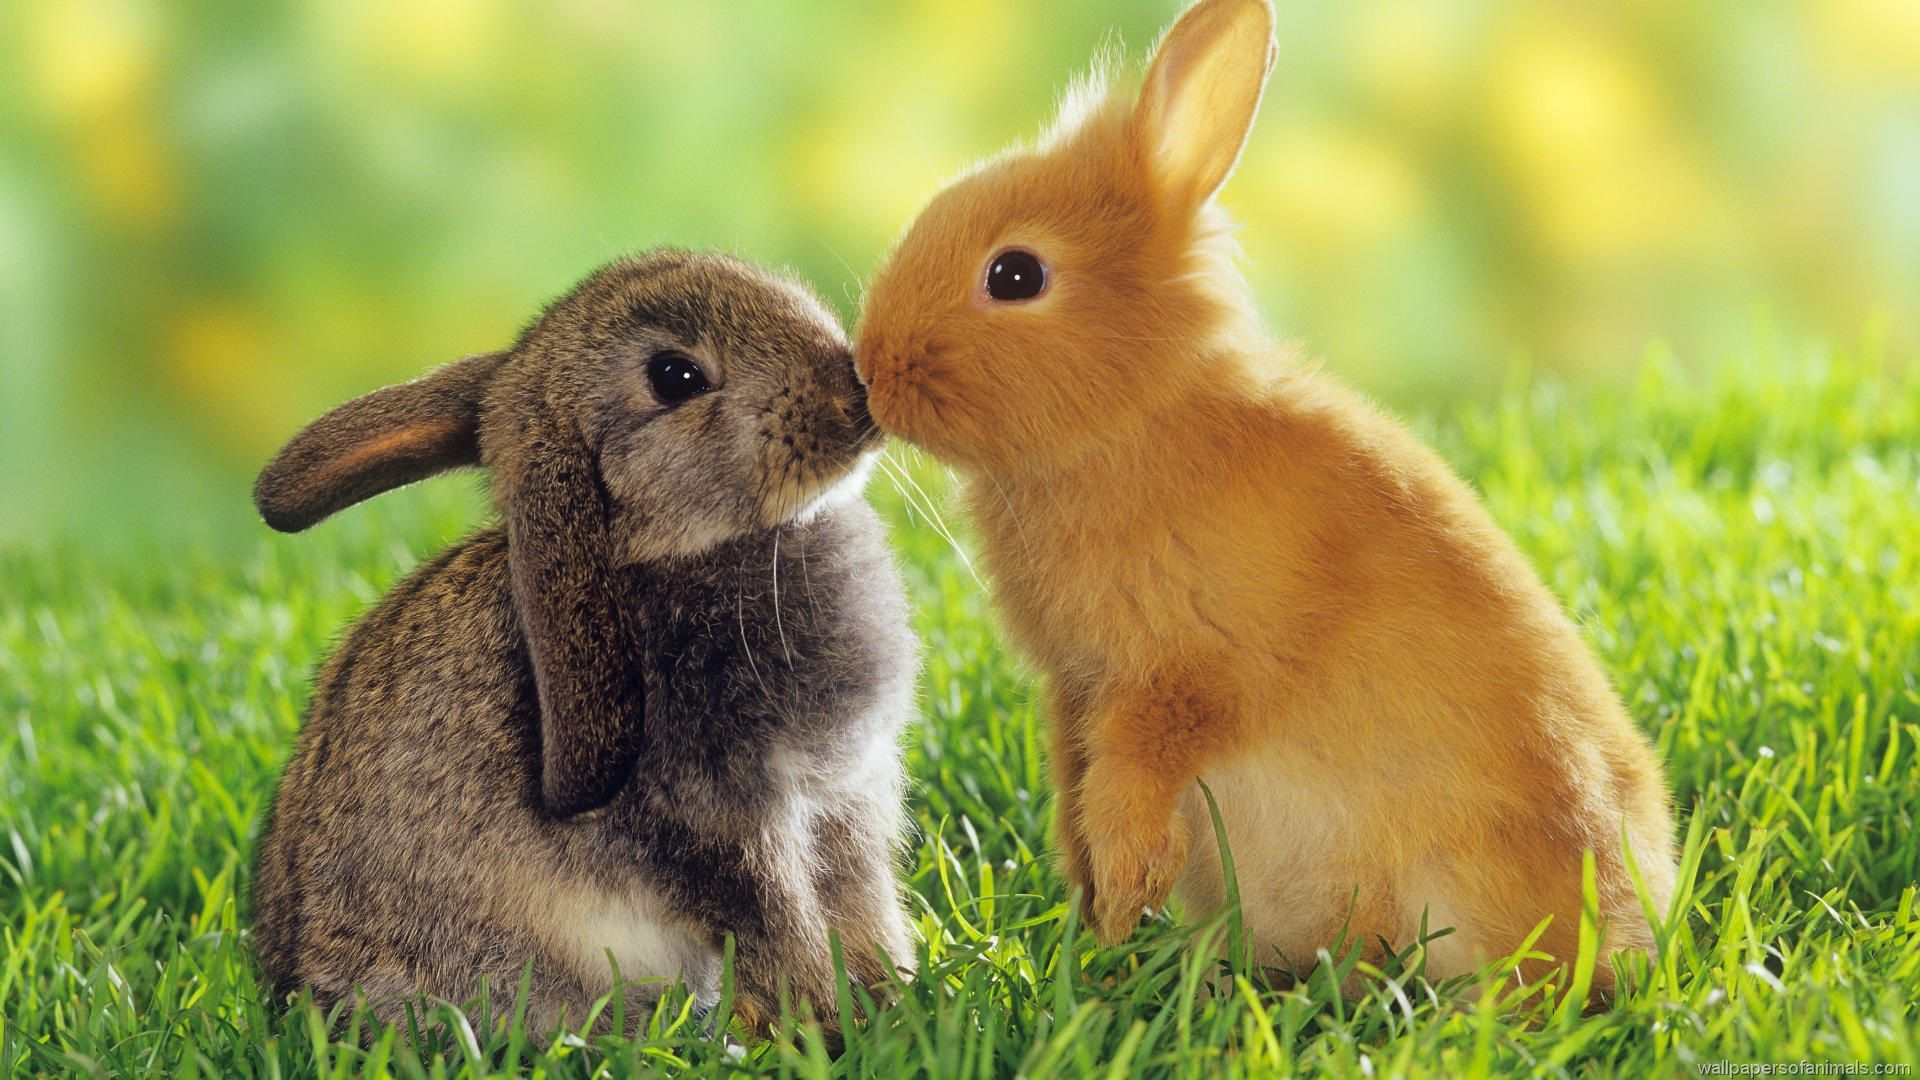 Kissing-Little-Rabbits-Wallpaper